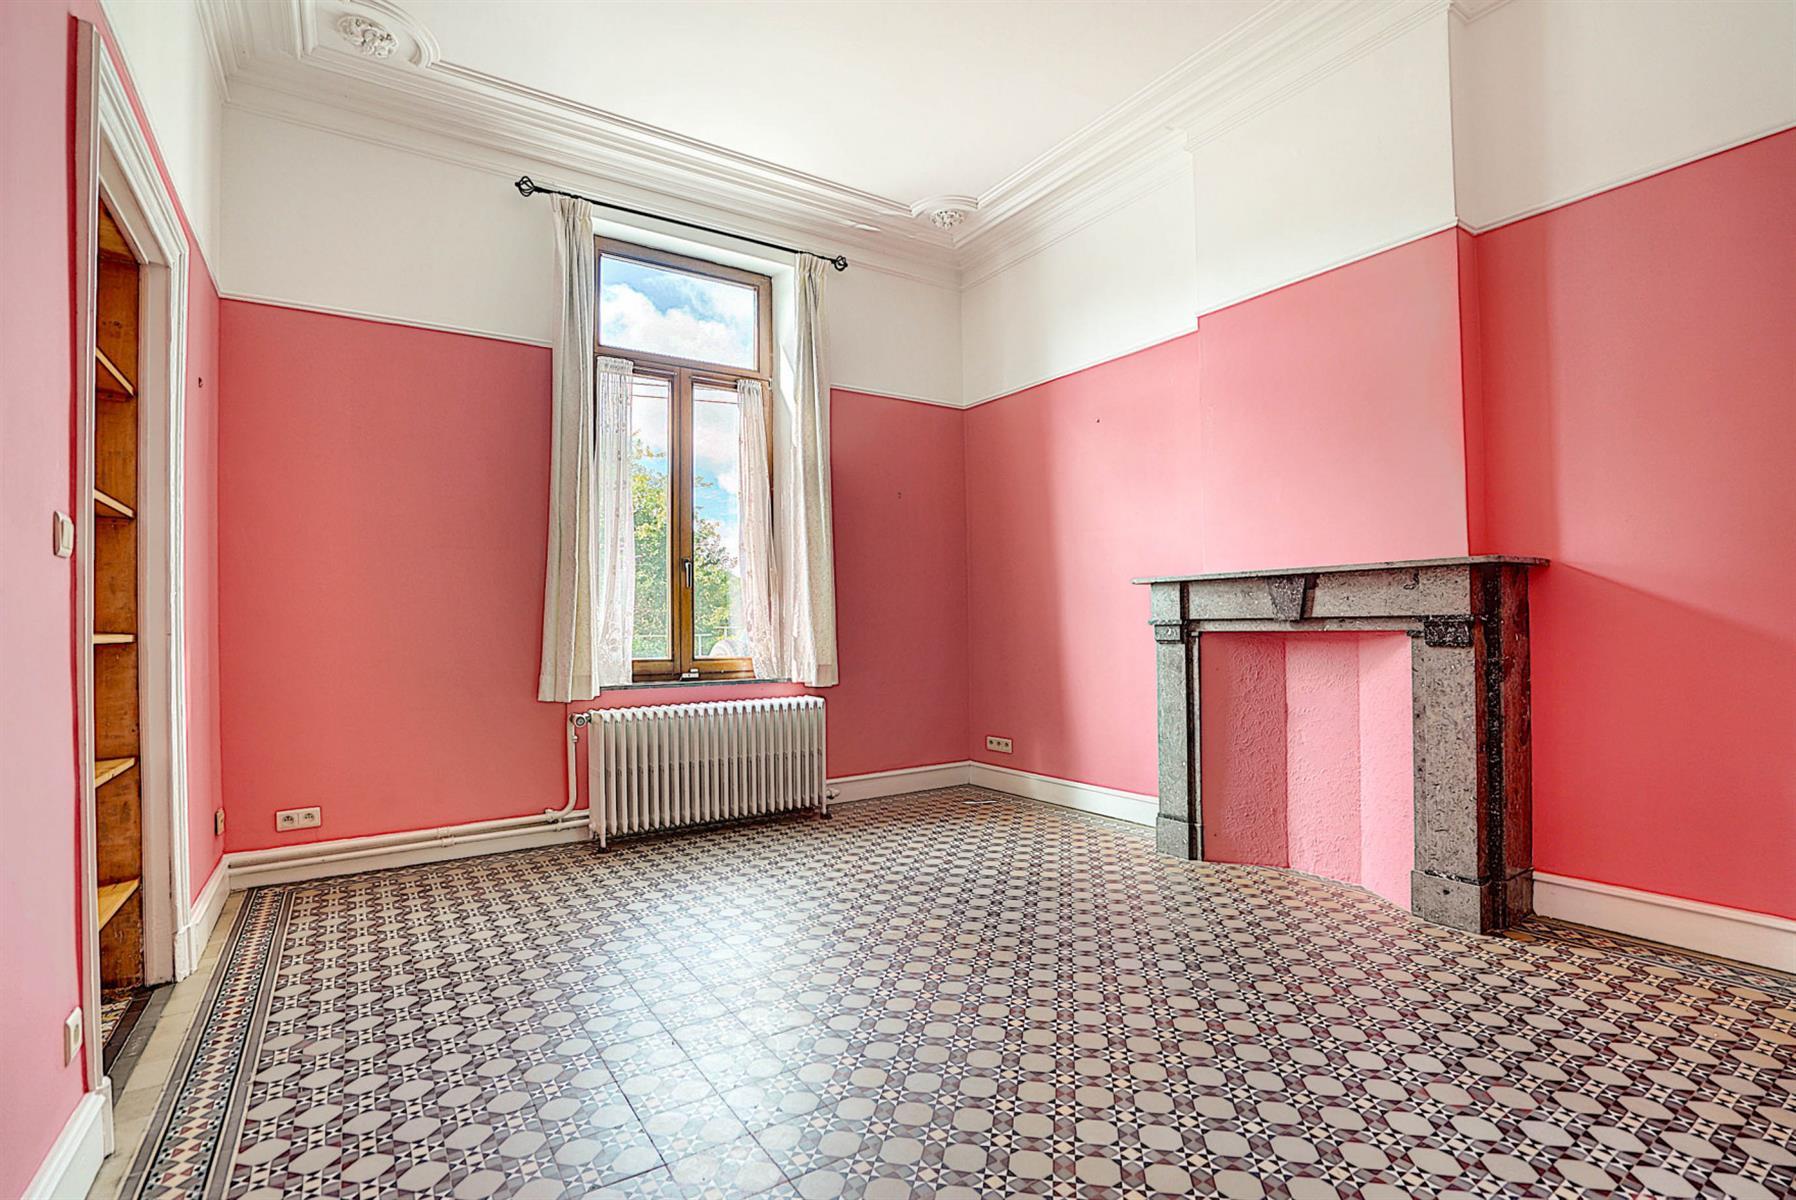 Maison - Bousval - #4131618-4